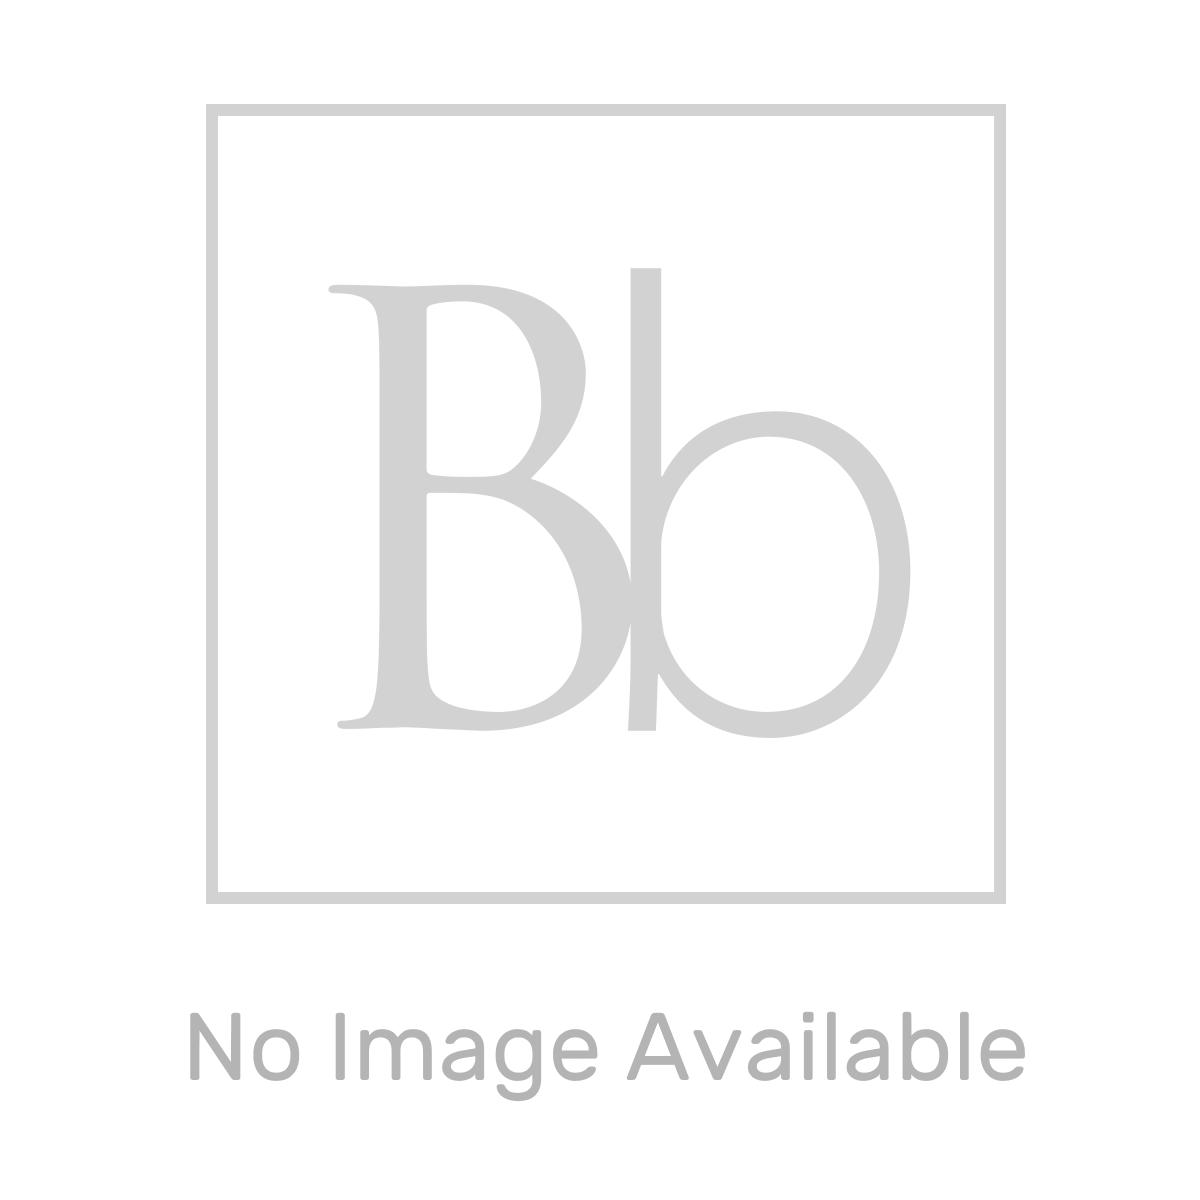 Zenith Pedras Bath Shower Mixer Tap